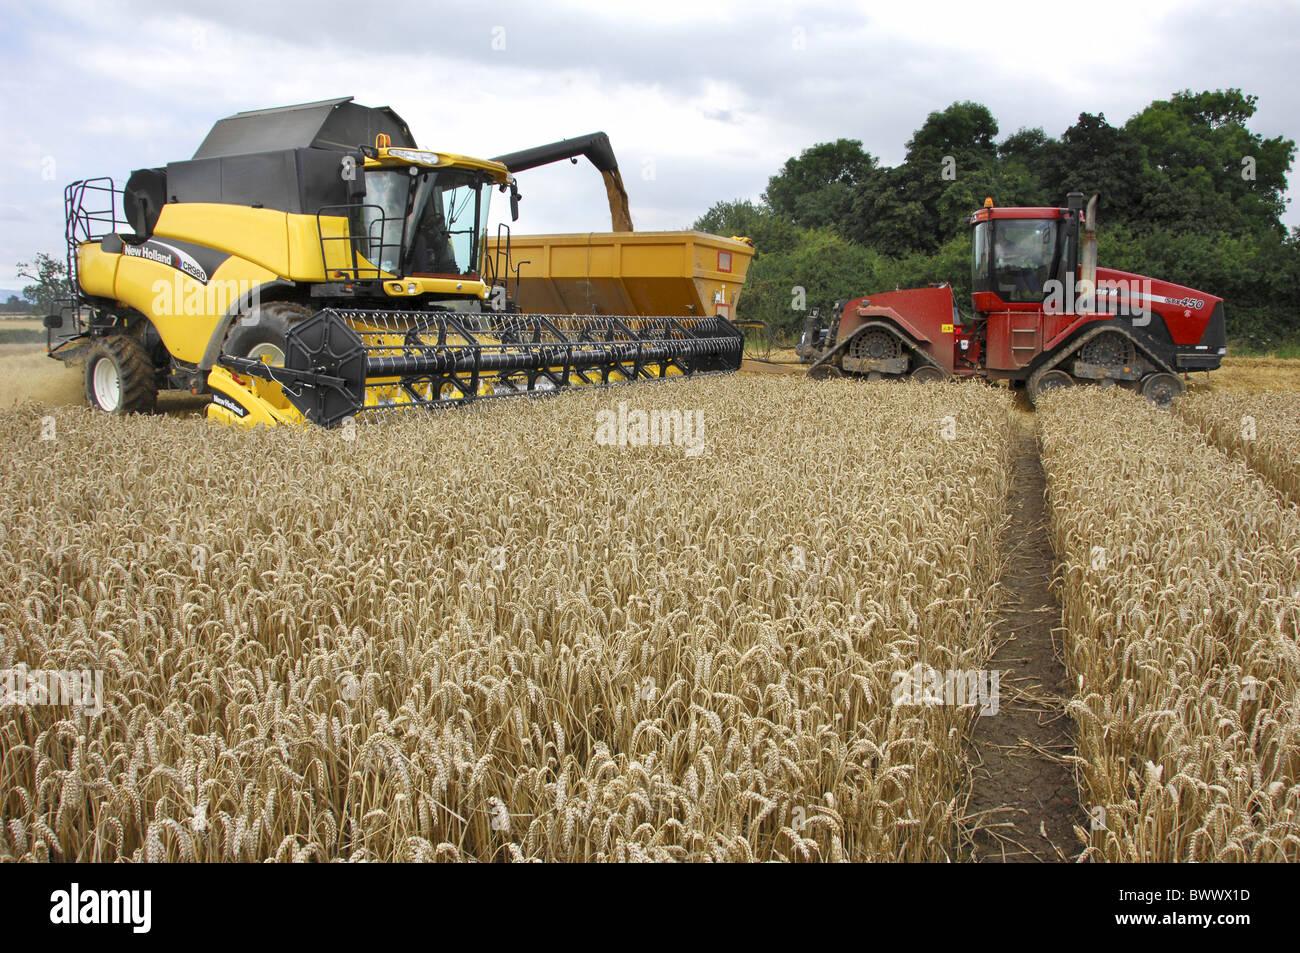 Wheat (Triticum aestivum) 'Alchemy', crop being harvested, New Holland combine harvester unloading into - Stock Image